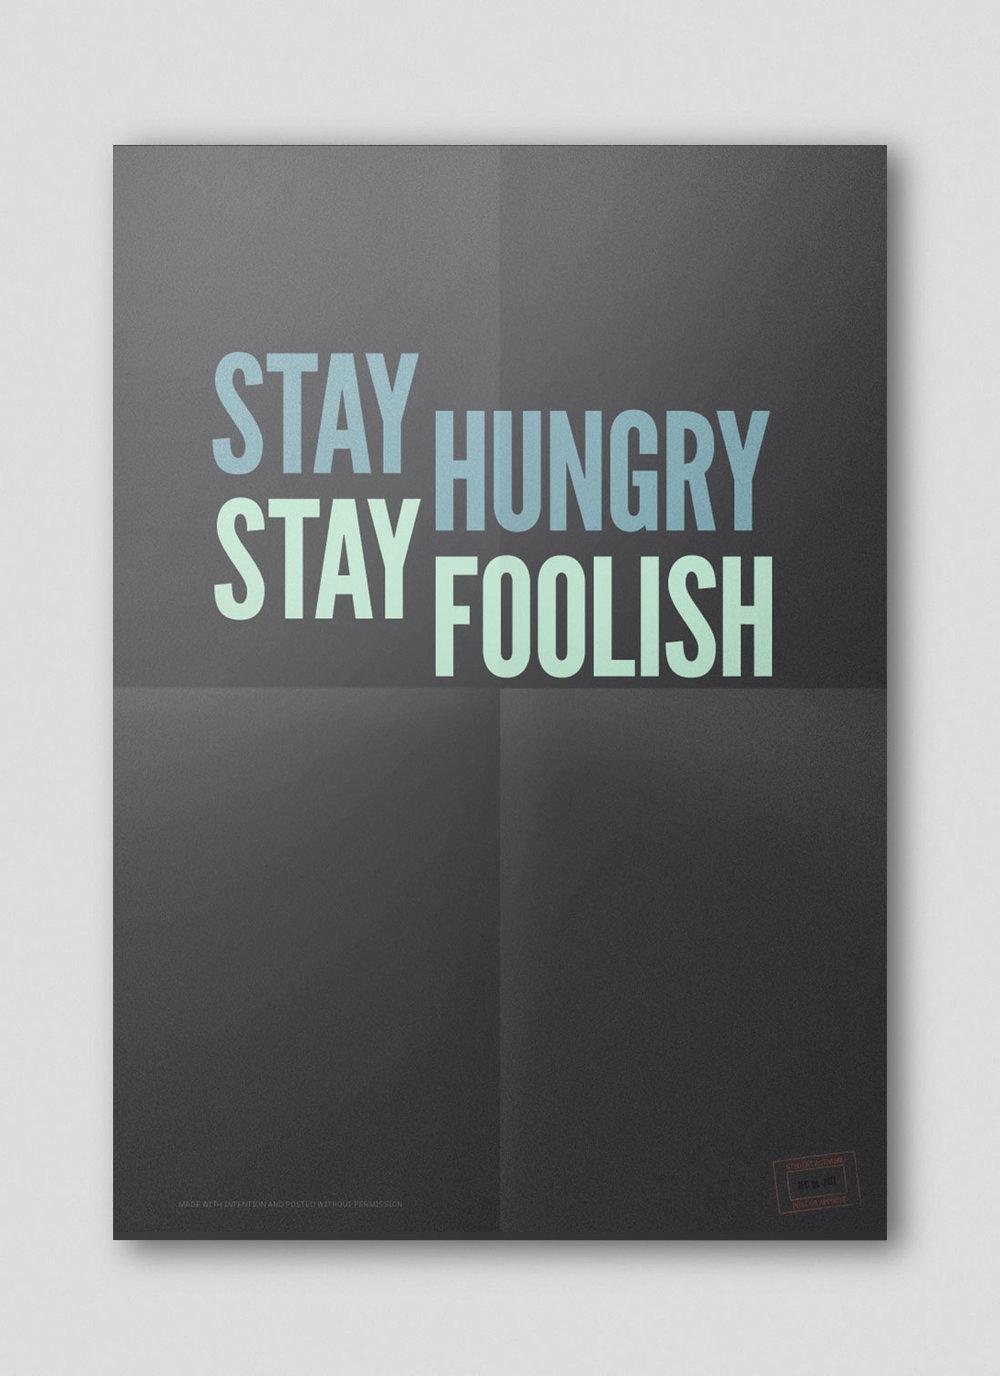 111105-stayhungry.jpg